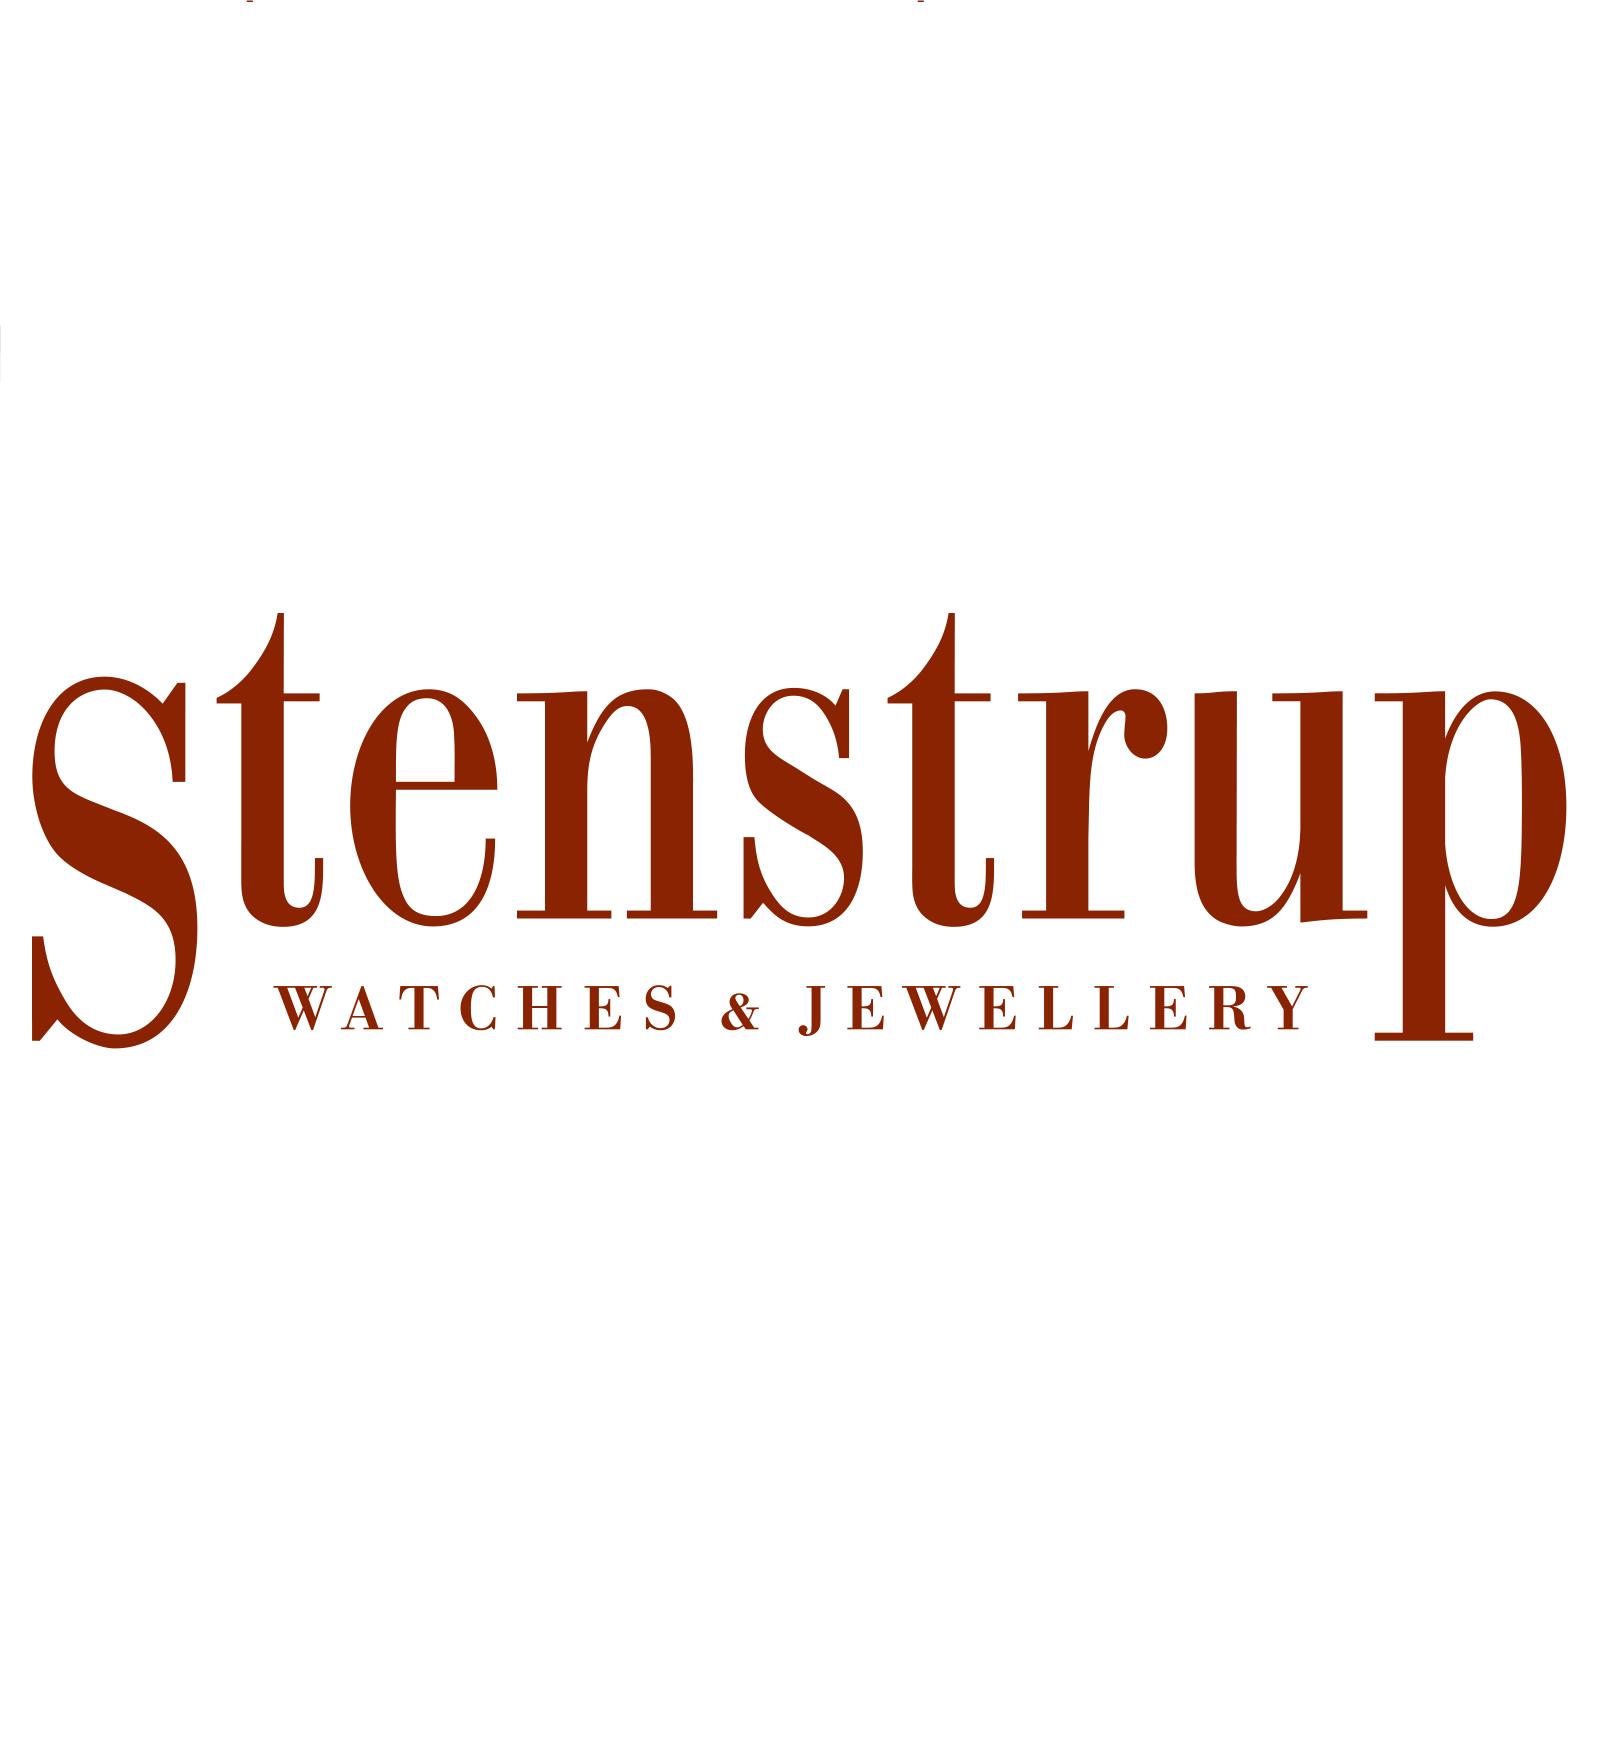 Stenstrup Watches & Jewellery - MondaniWeb